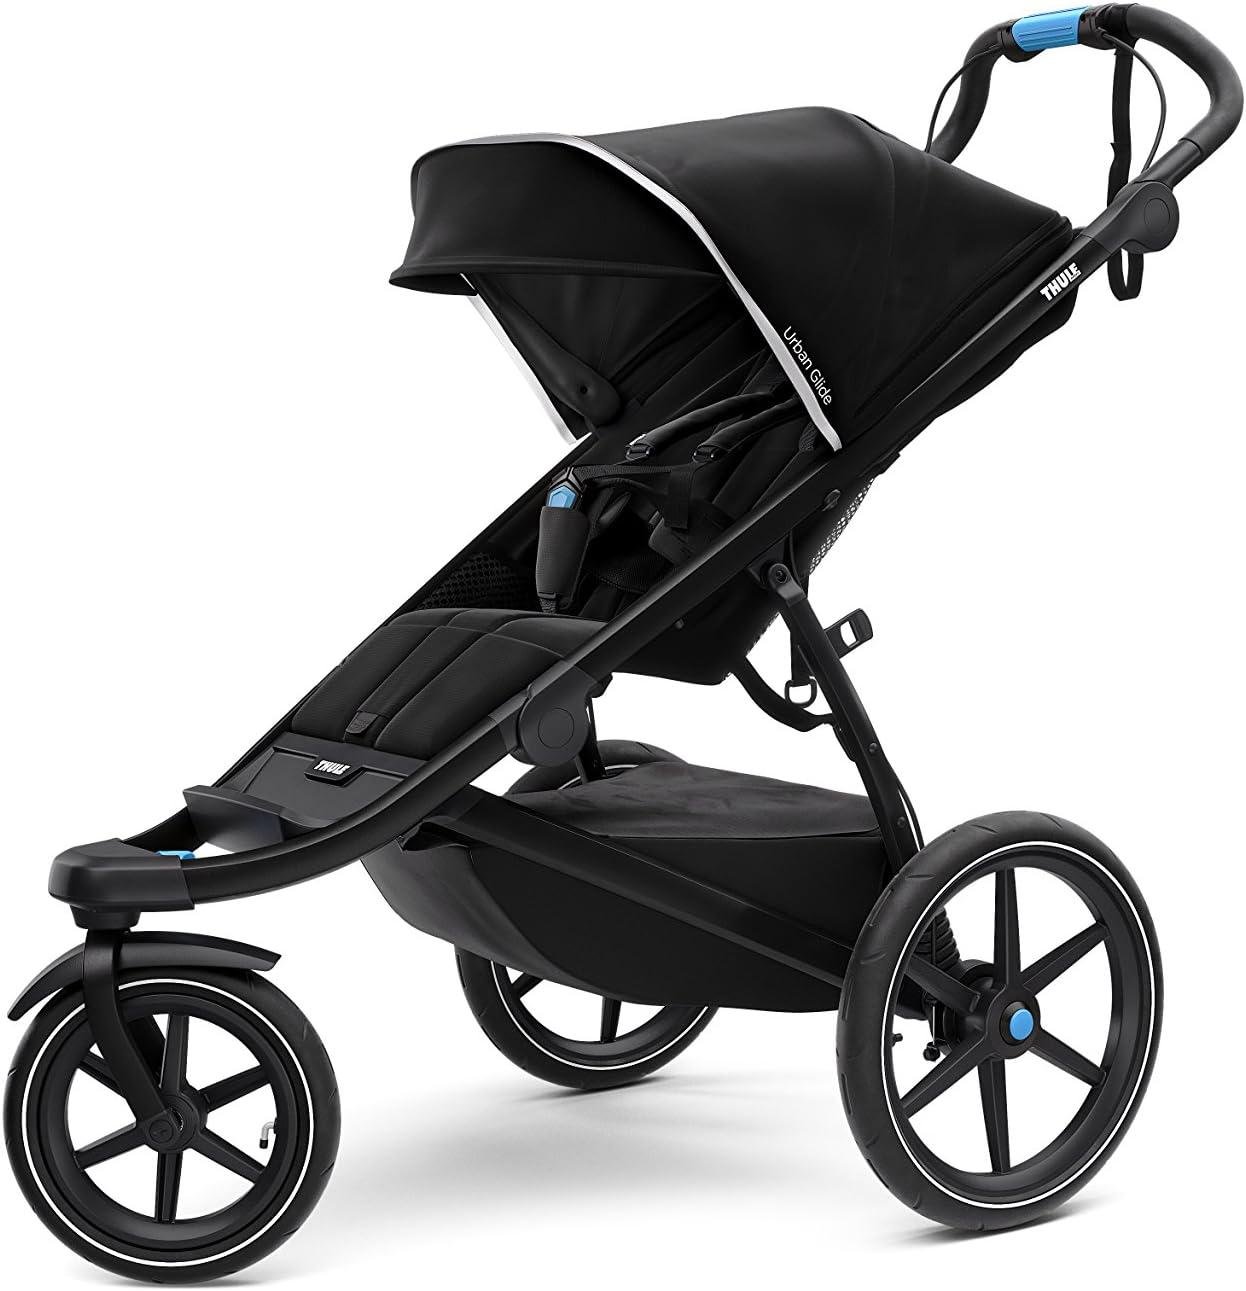 Offerta: Thule Urban Glide, Passeggino Unisex Bambini